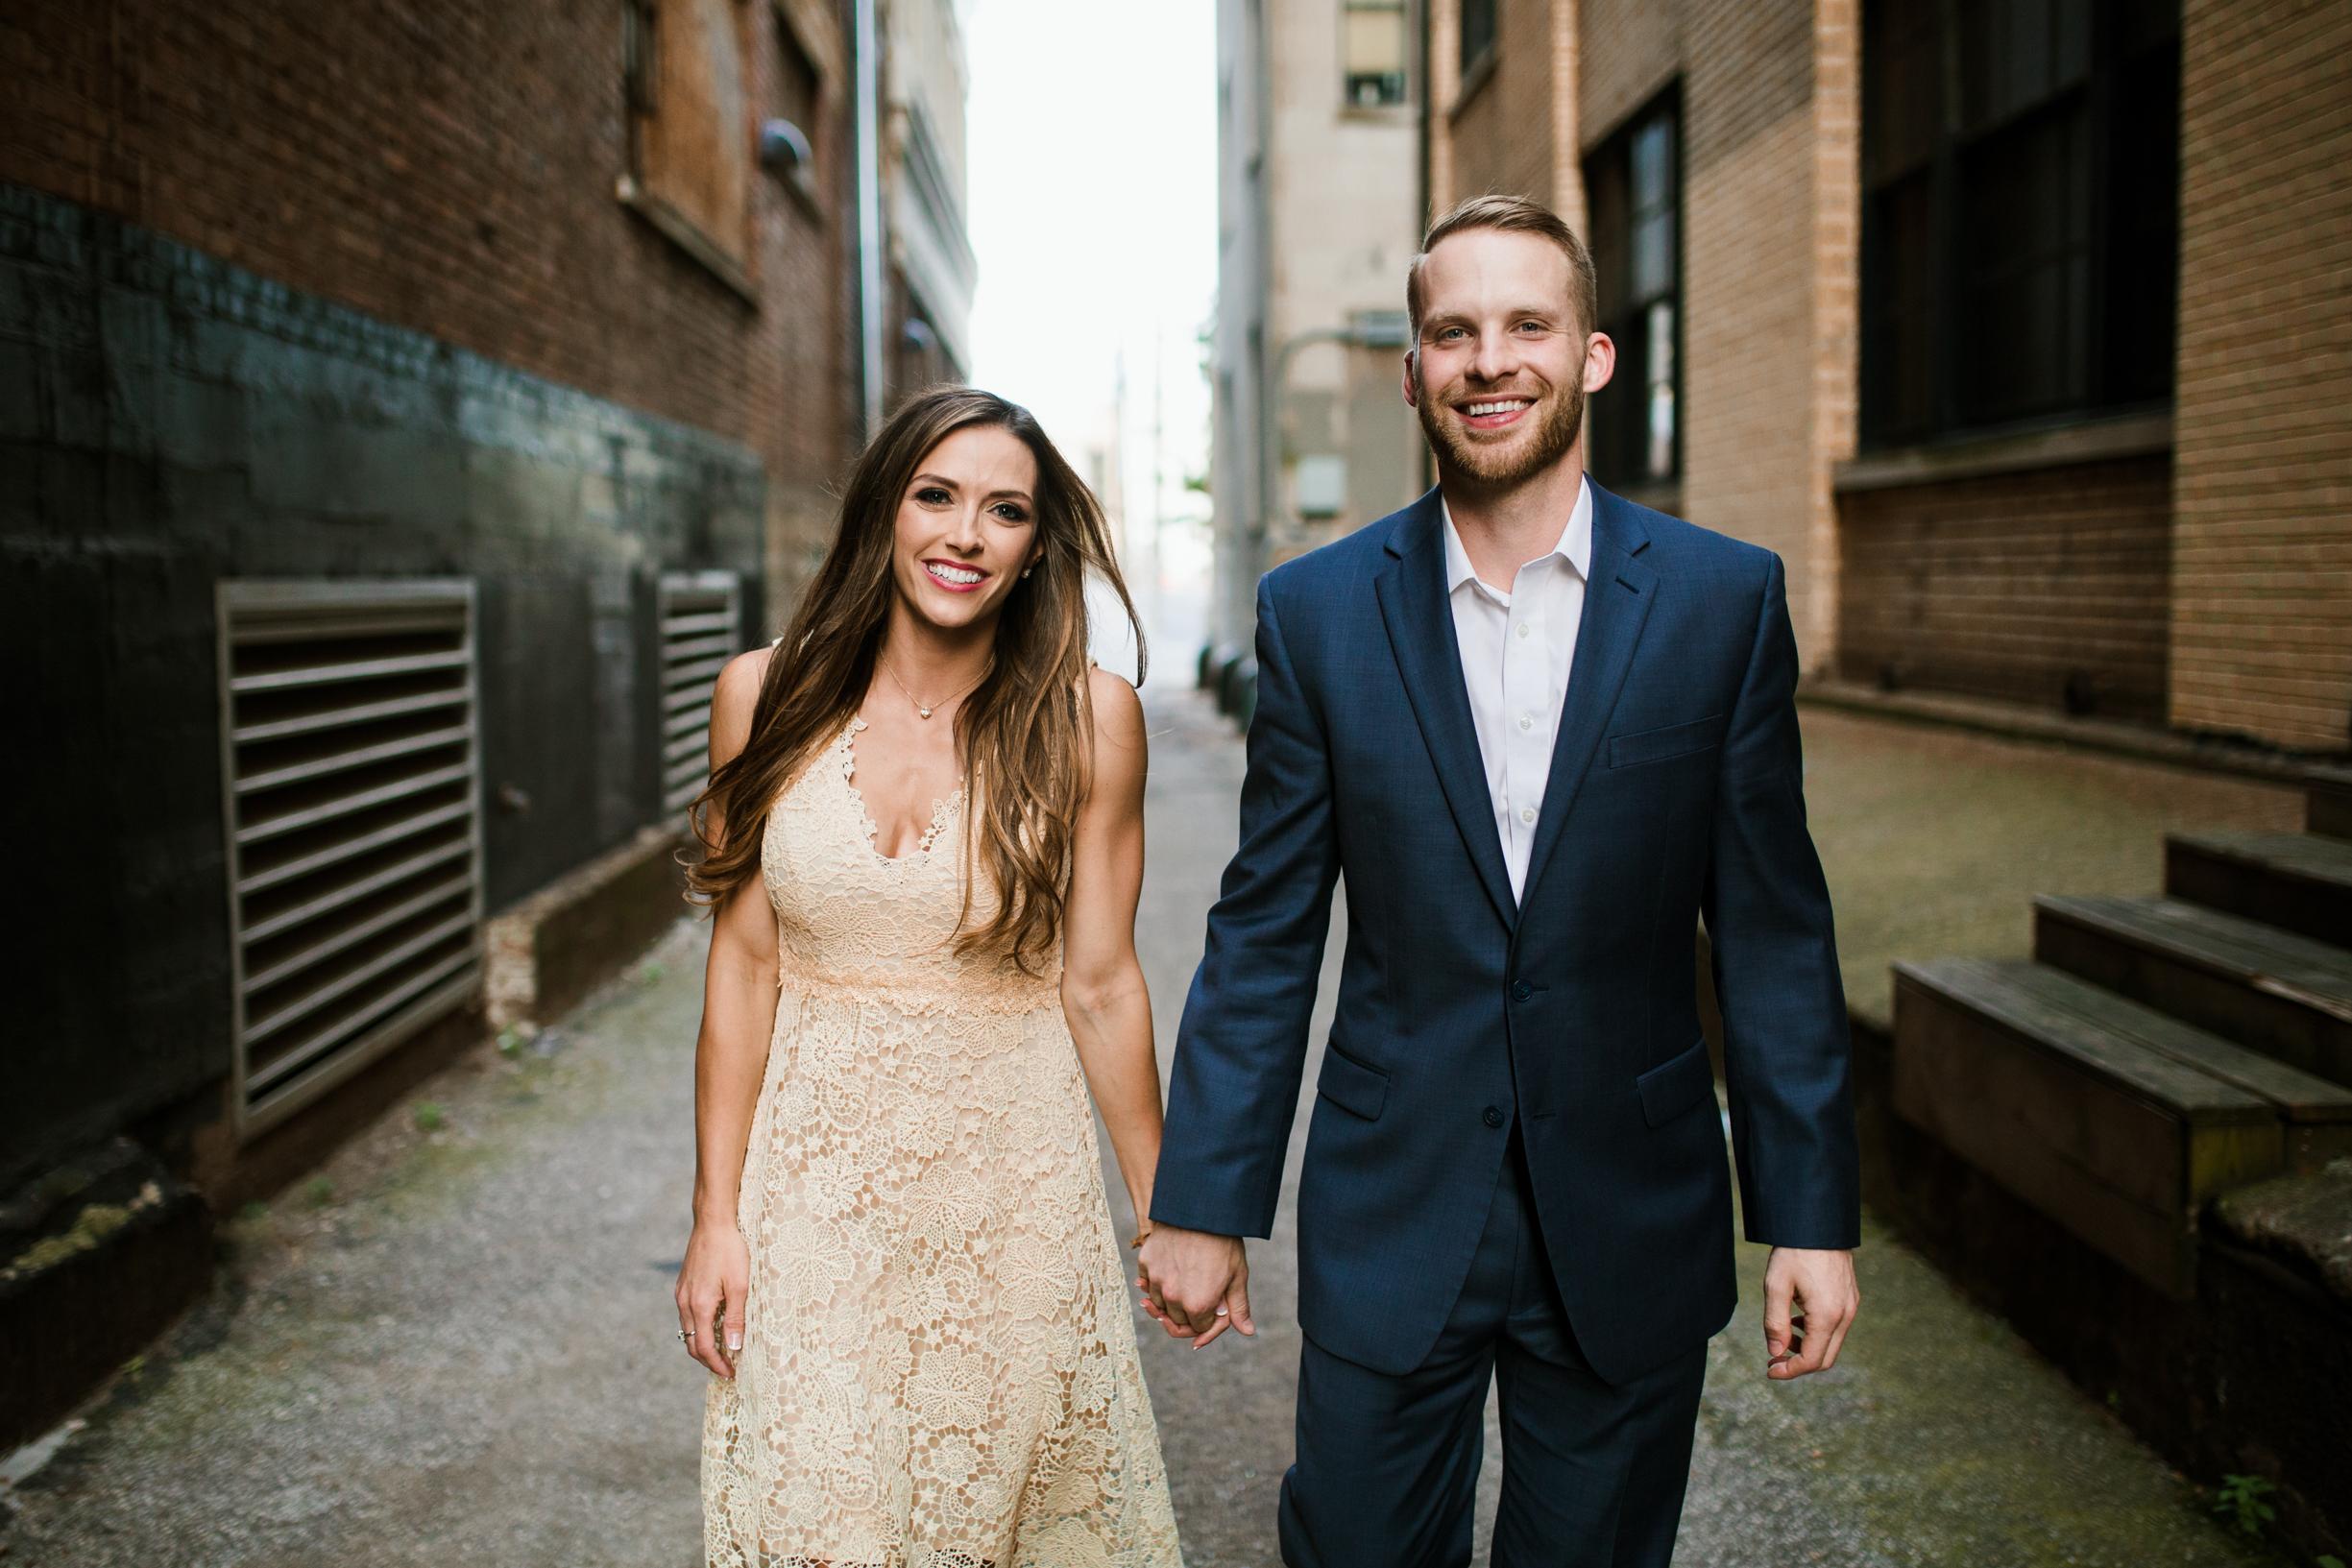 Victoria & Chad Engagement 2018 Crystal Ludwick Photo Louisville Kentucky Wedding Photographer WEBSITE (5 of 48).jpg